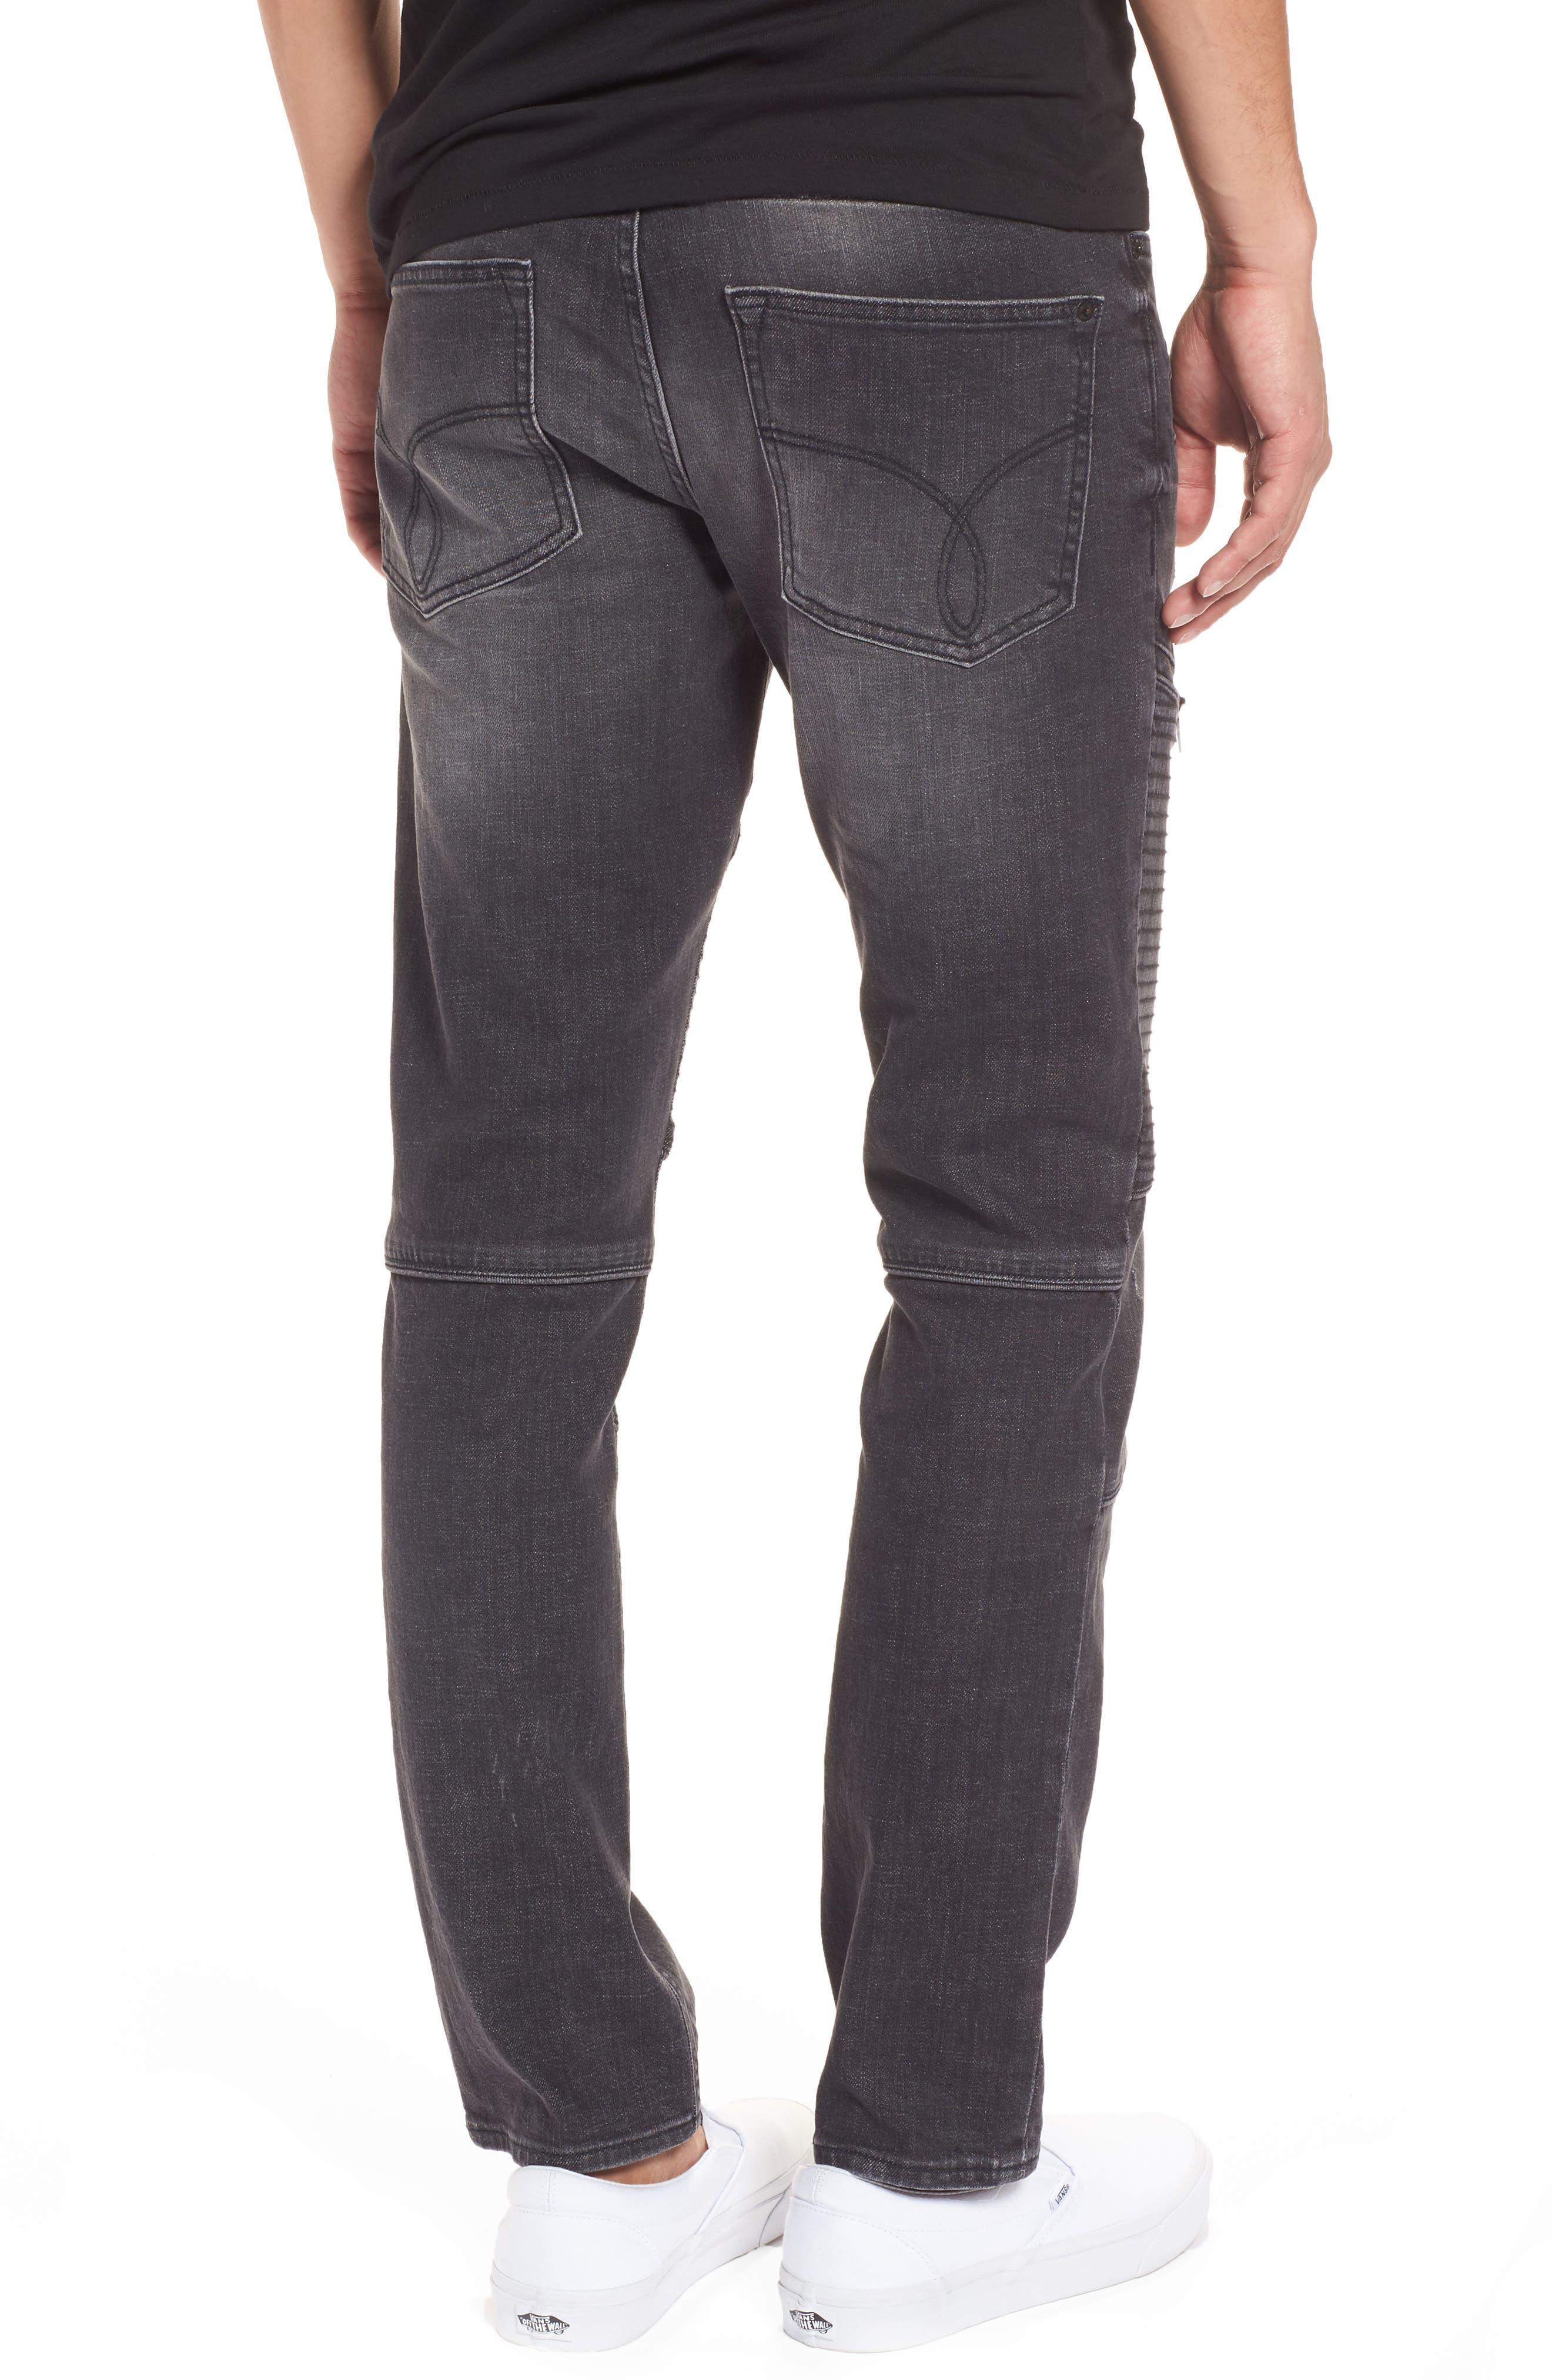 Biker Denim Jeans,                             Alternate thumbnail 2, color,                             Black